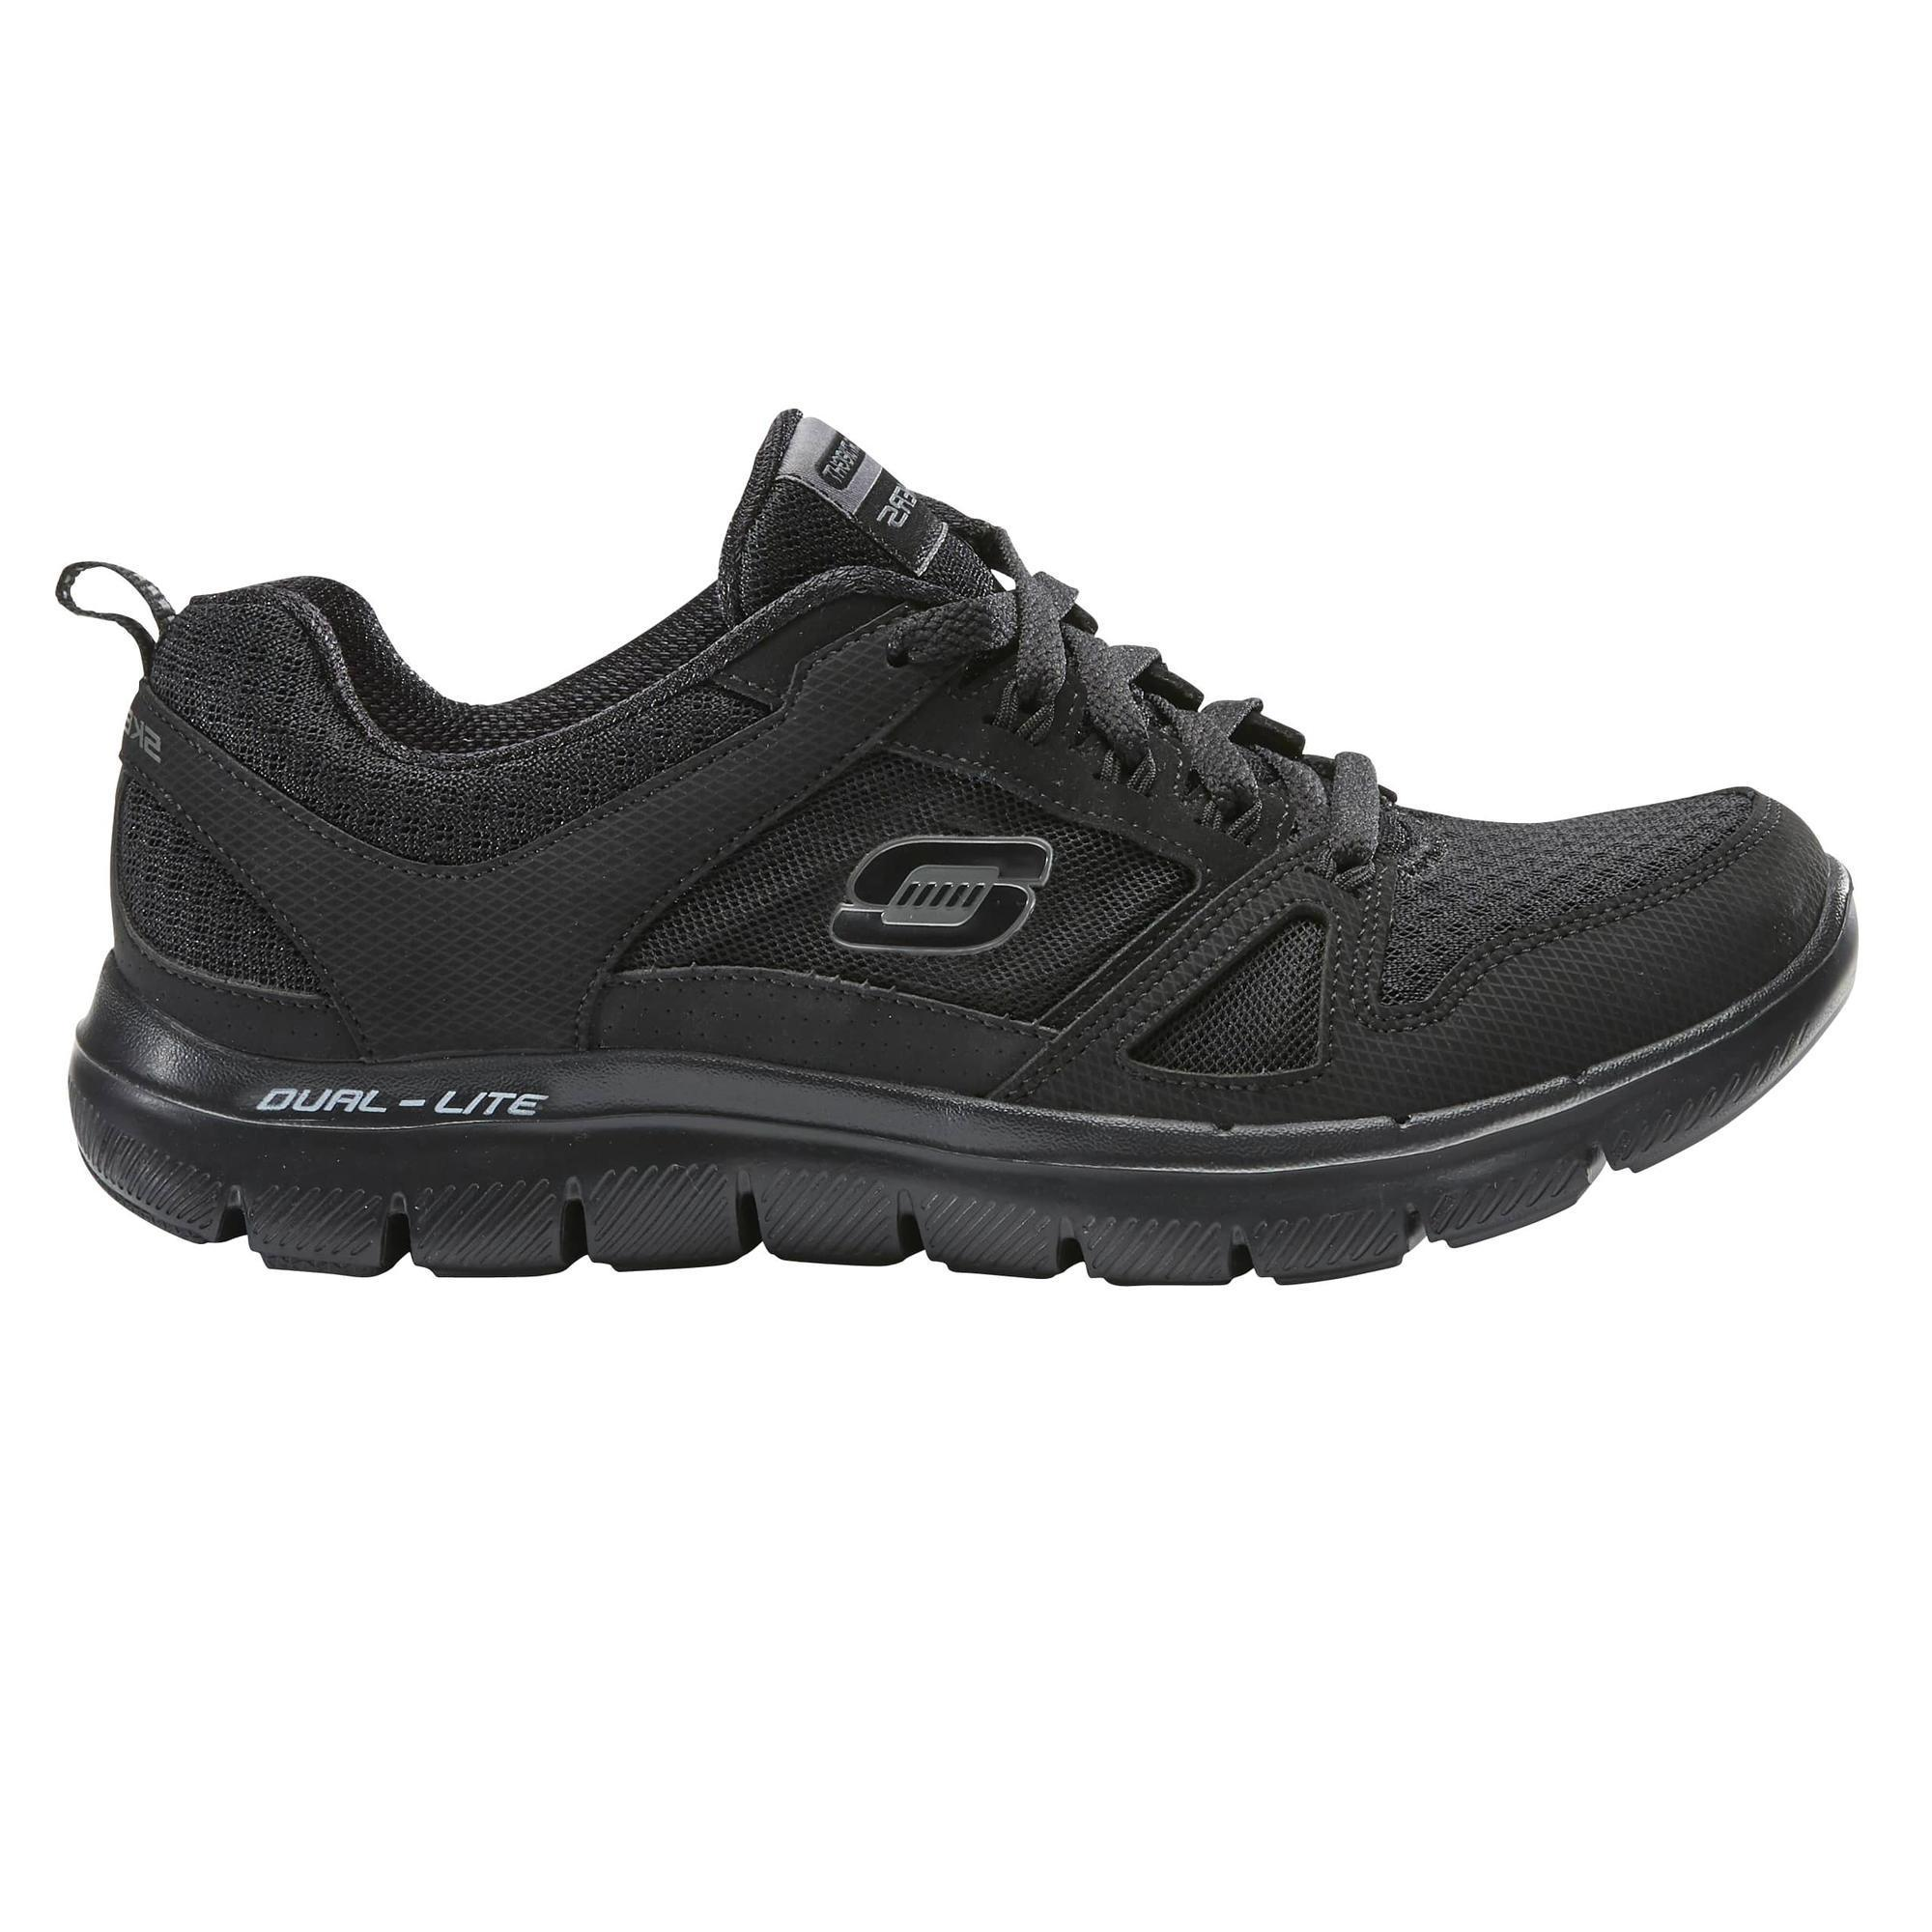 Dual women's fitness walking shoes full